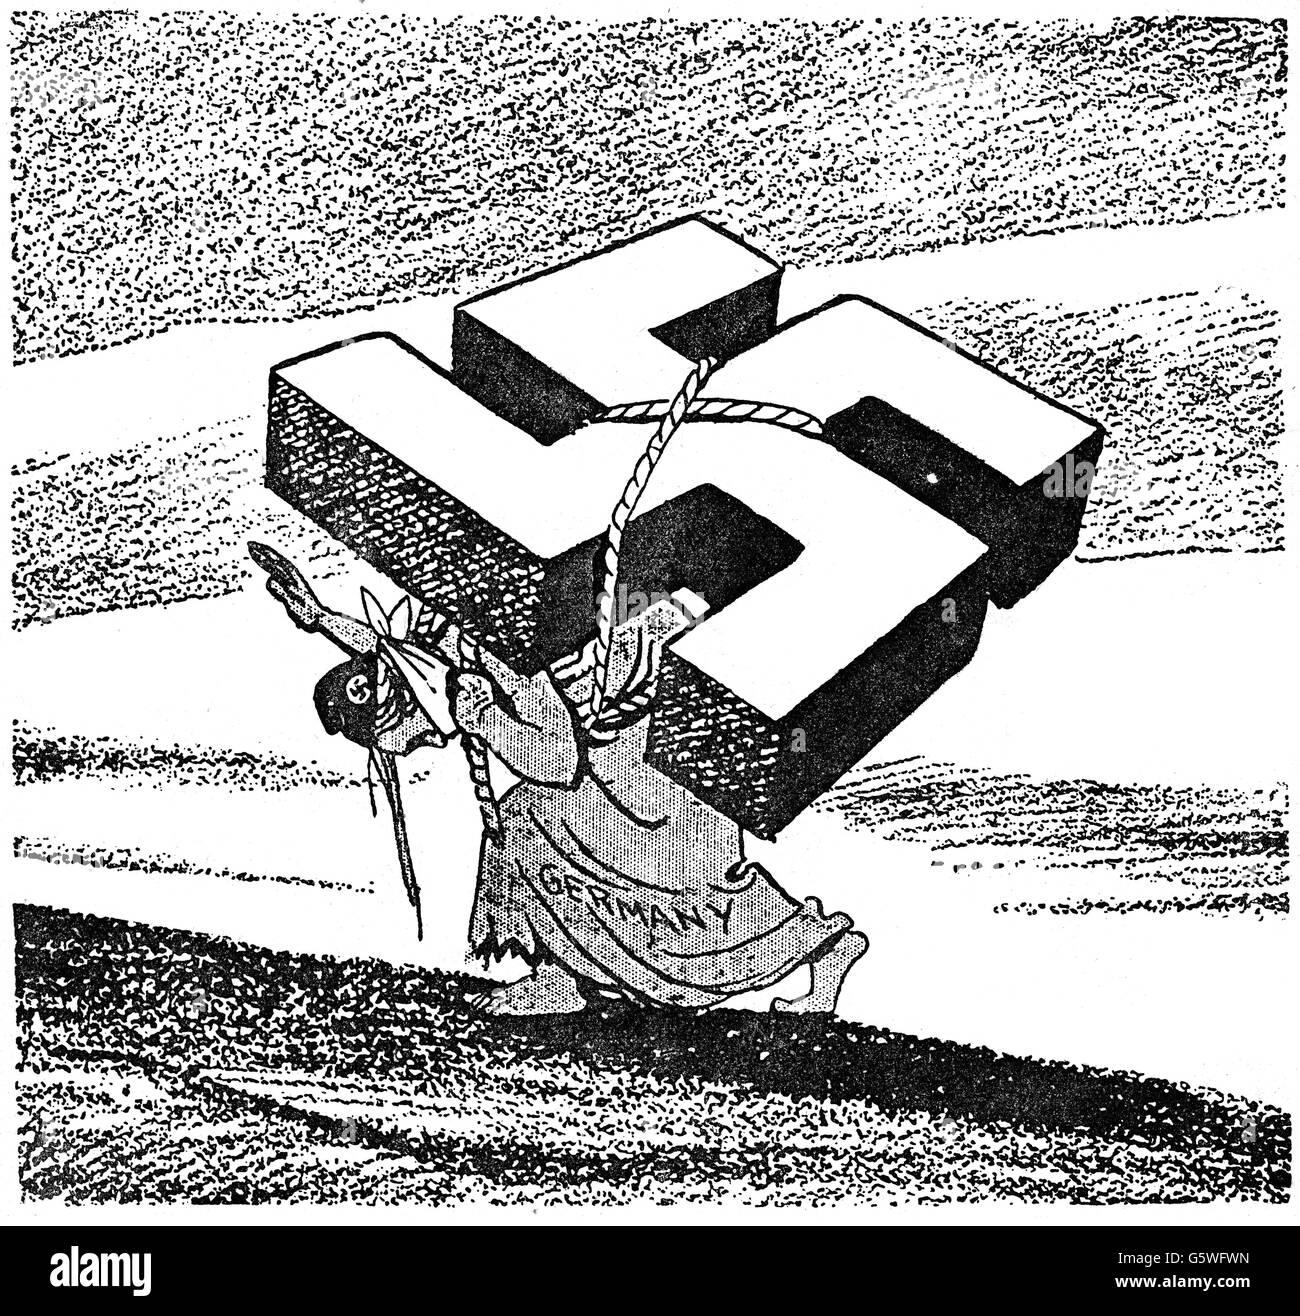 Nationalsozialismus Karikatur